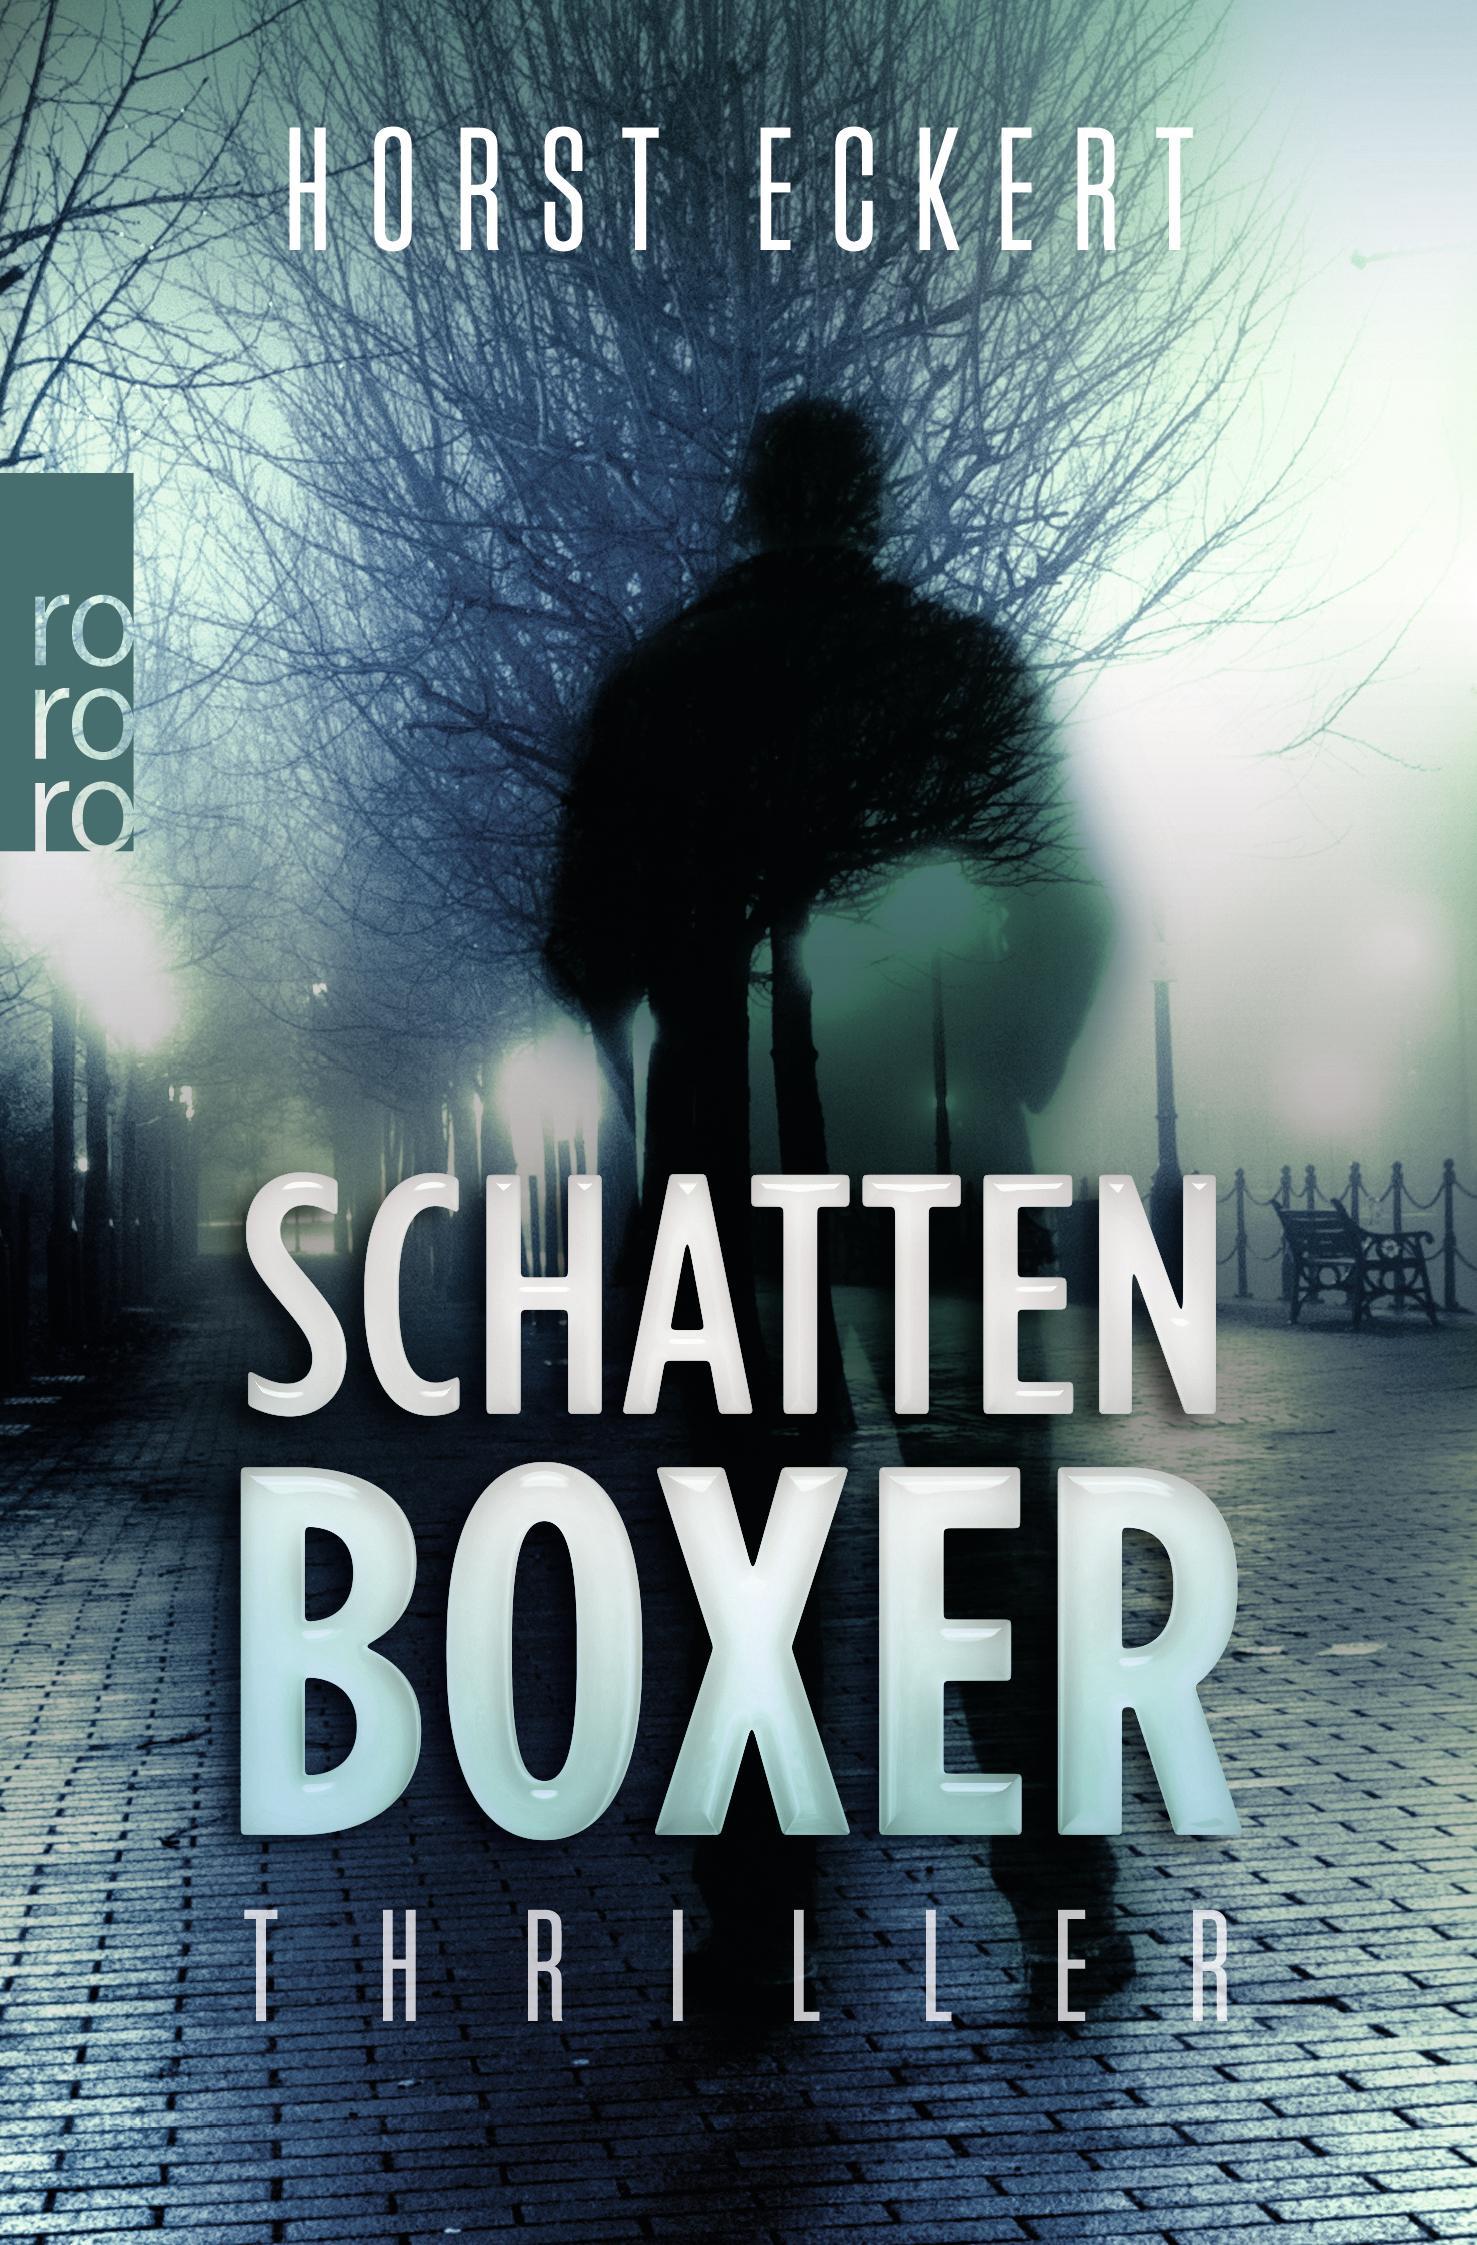 Schattenboxer Horst Eckert